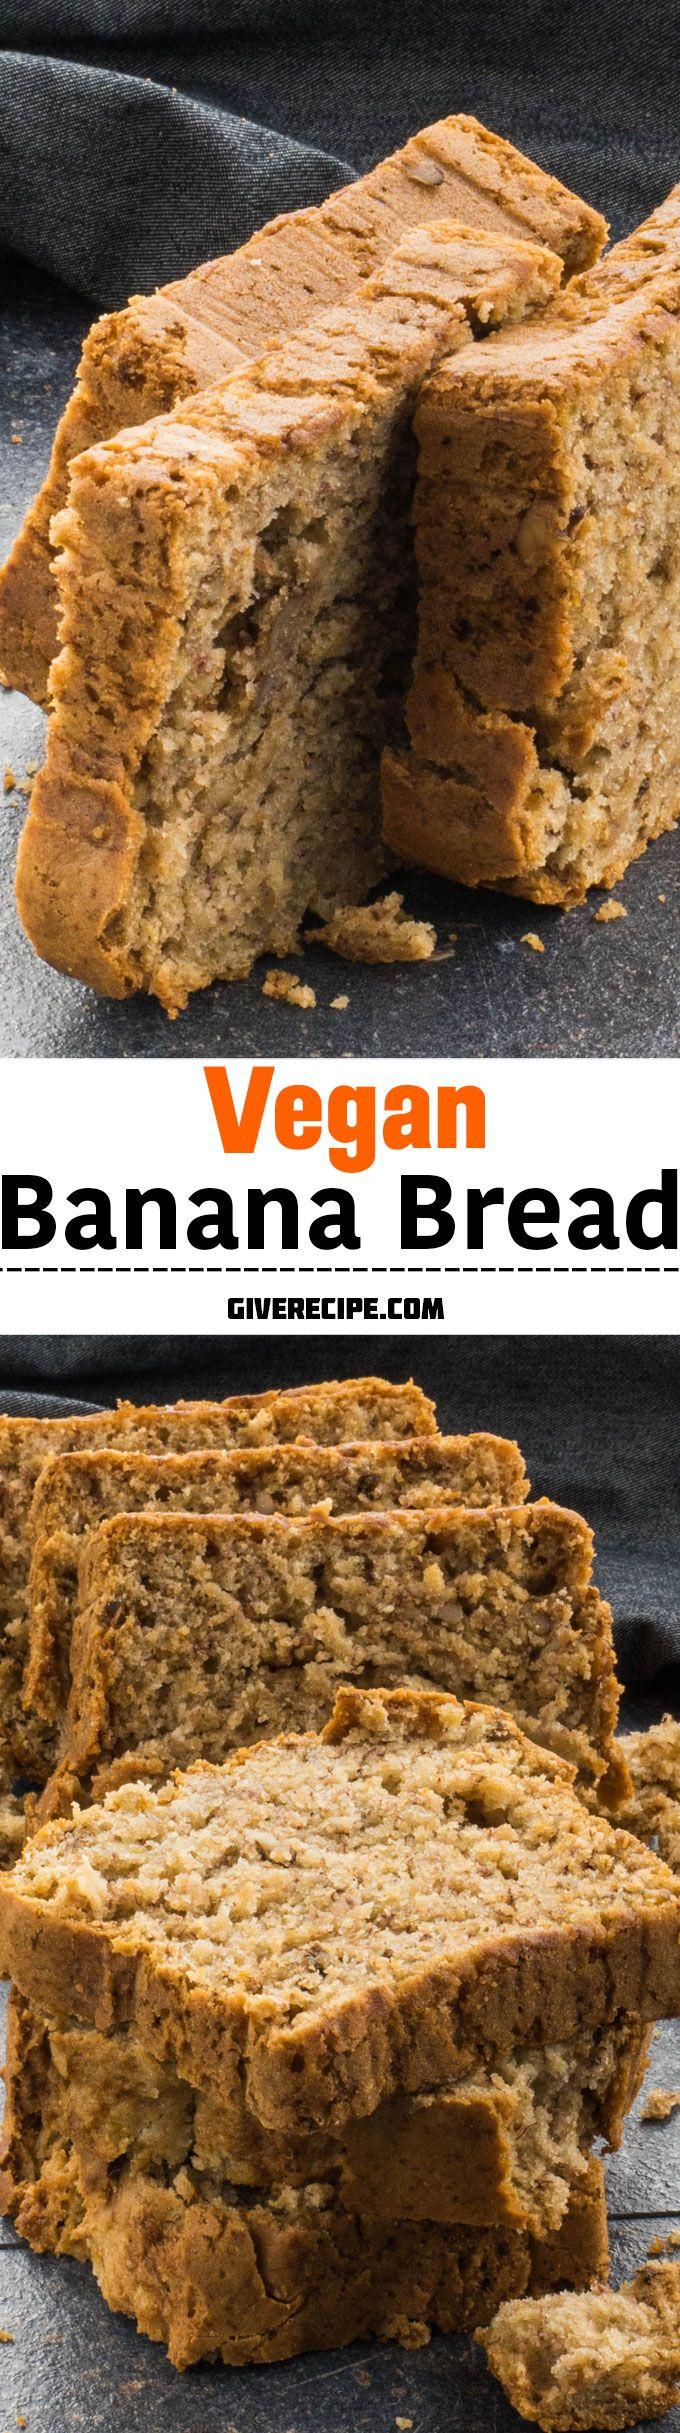 Vegan Banana Bread Give Recipe Recipe Vegan Banana Bread Vegan Baking Recipes Vegan Banana